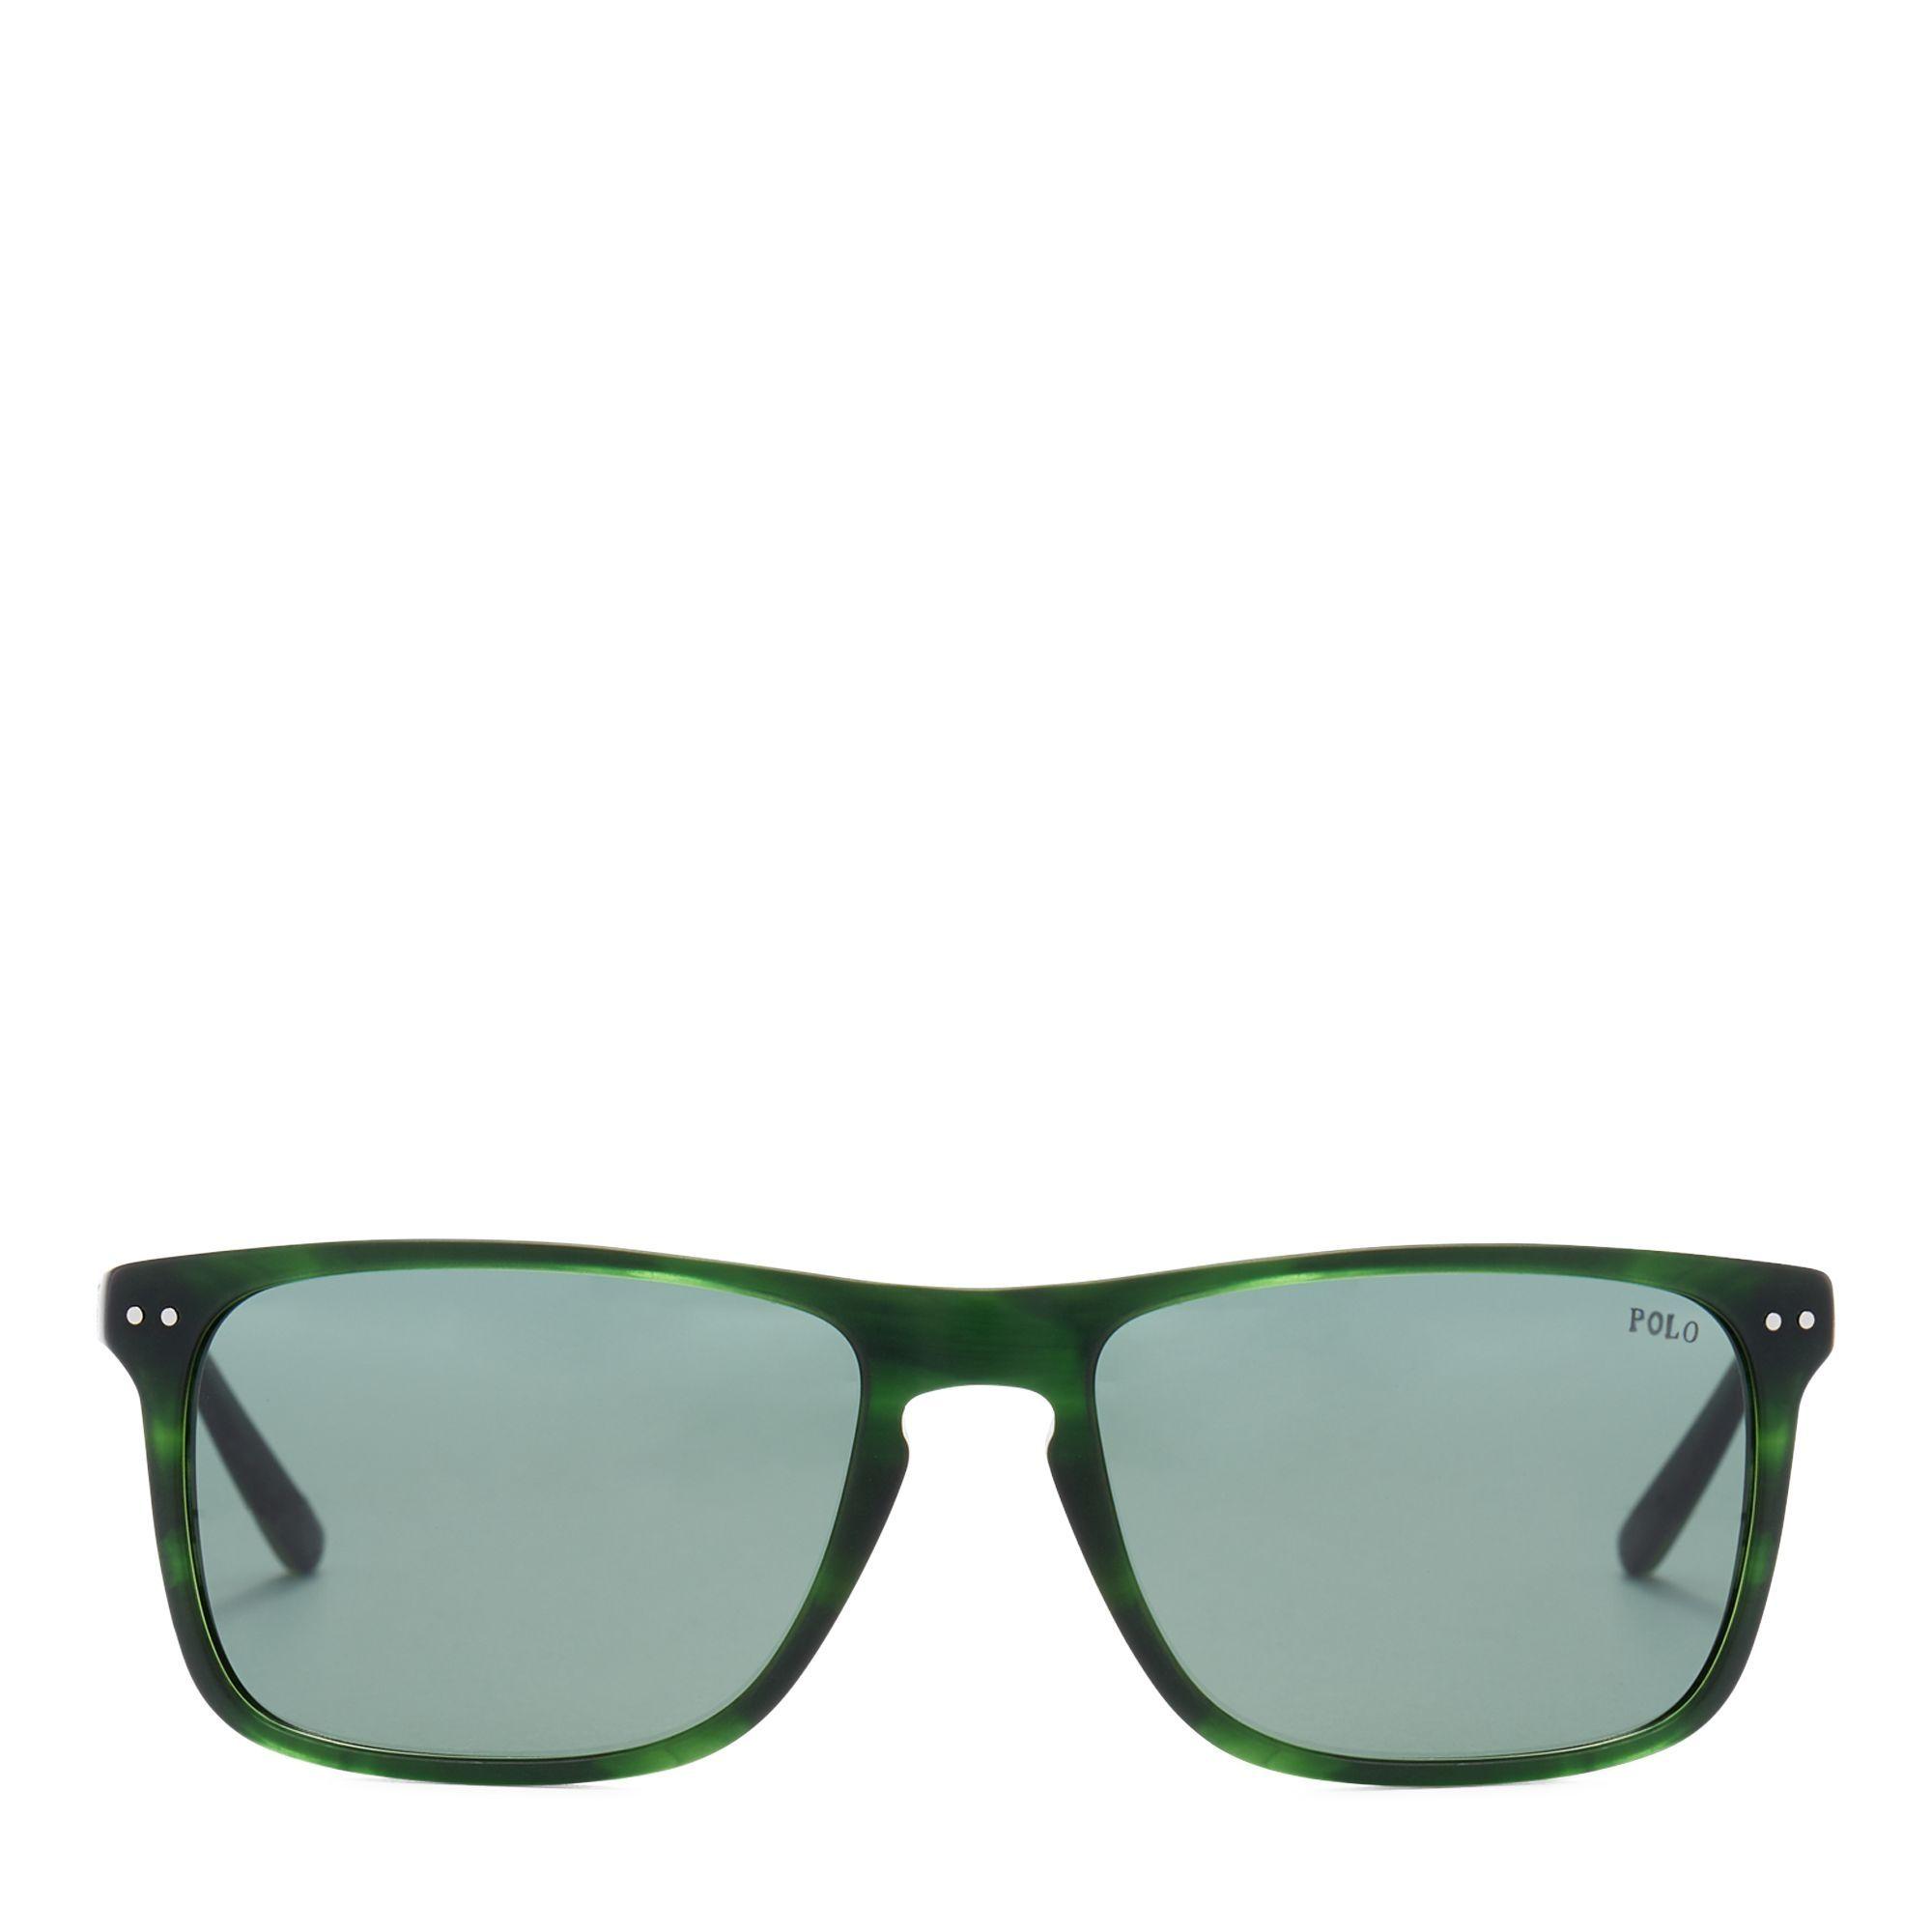 21064b6baf9f Polo Ralph Lauren Metal Temple Sunglasses | Sunglasses | kanbkam.com